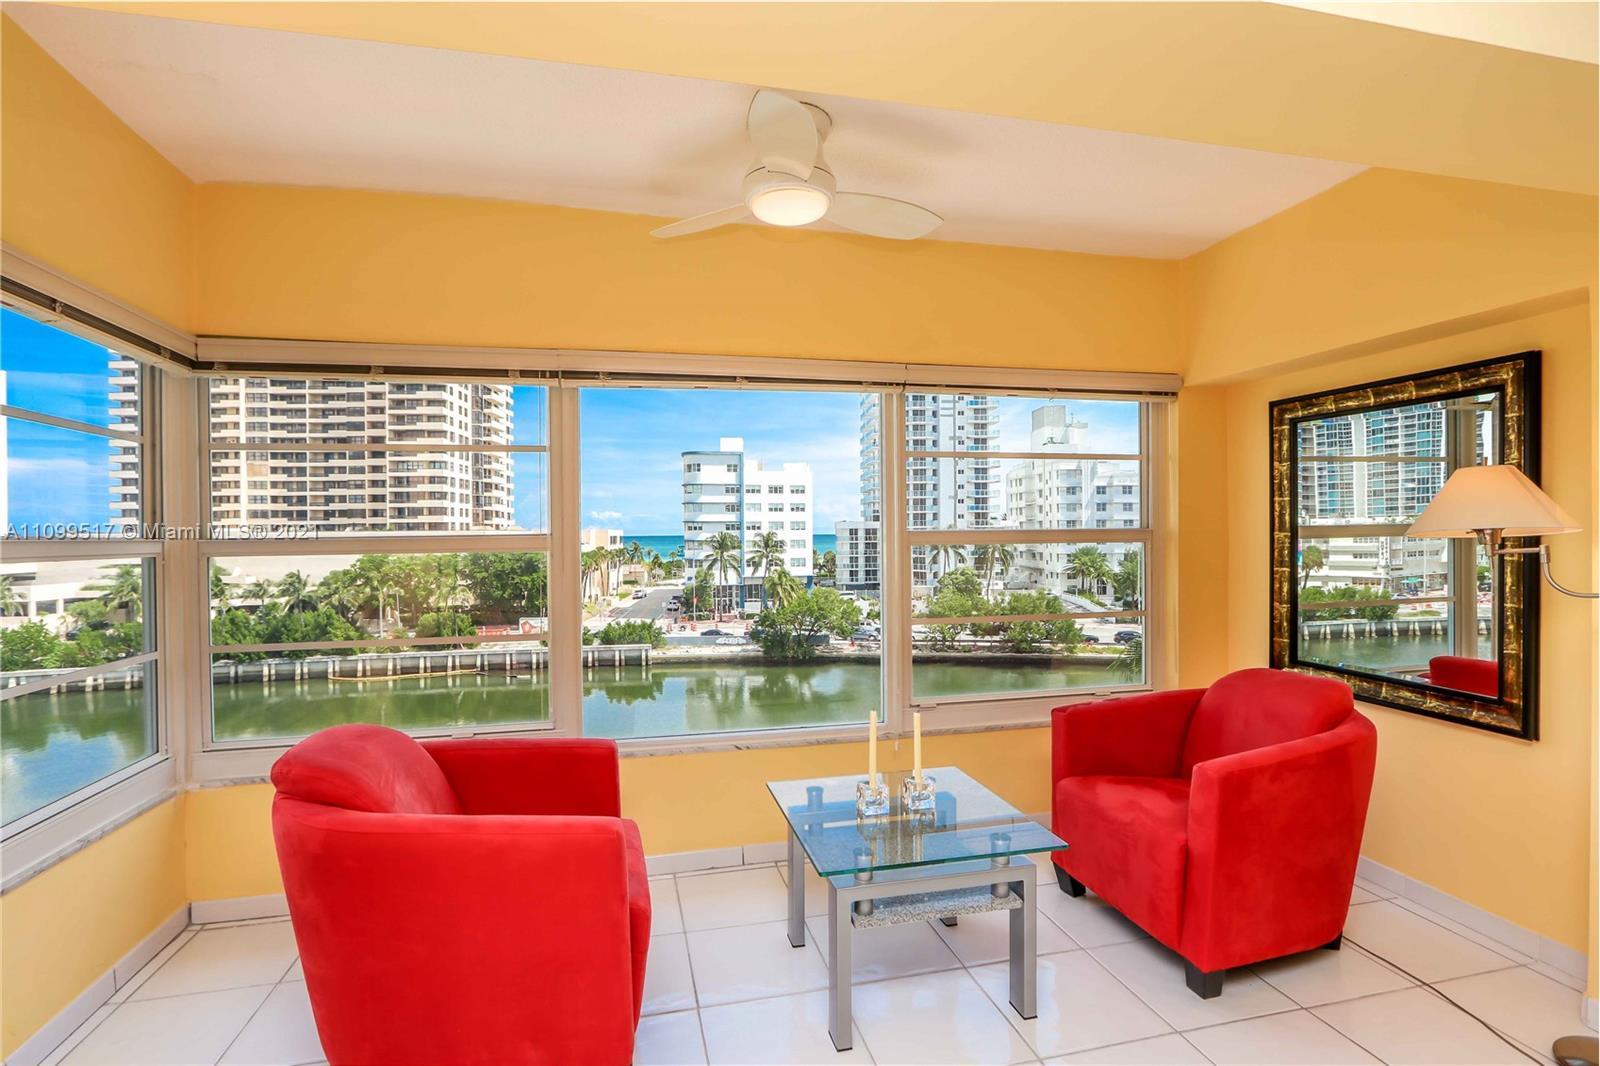 2455 Flamingo Dr Unit 501, Miami Beach, Florida 33140